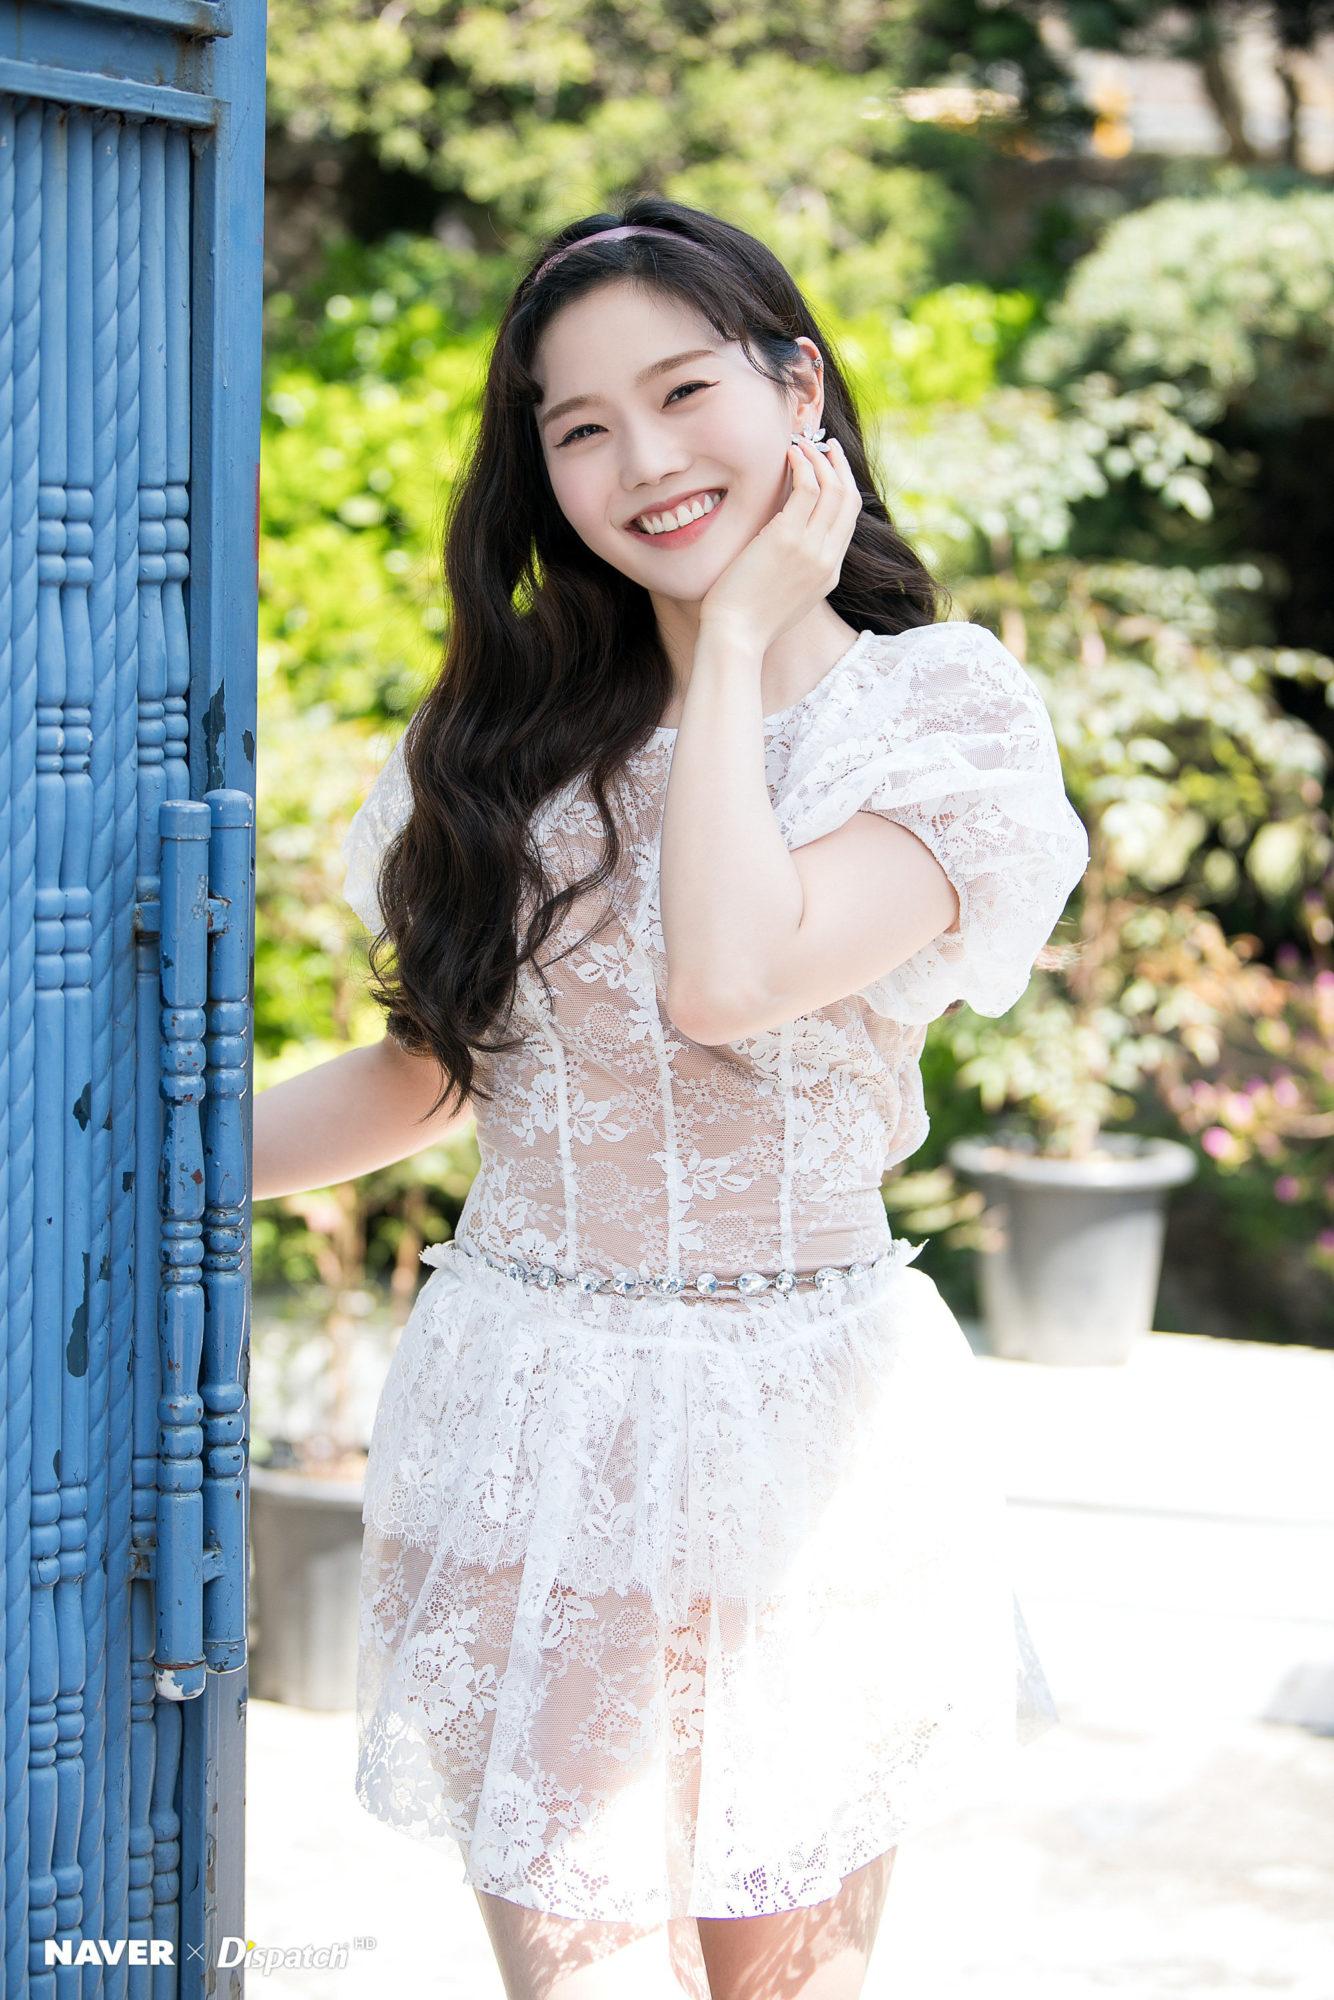 Oh My Girl Hyojung NONSTOP